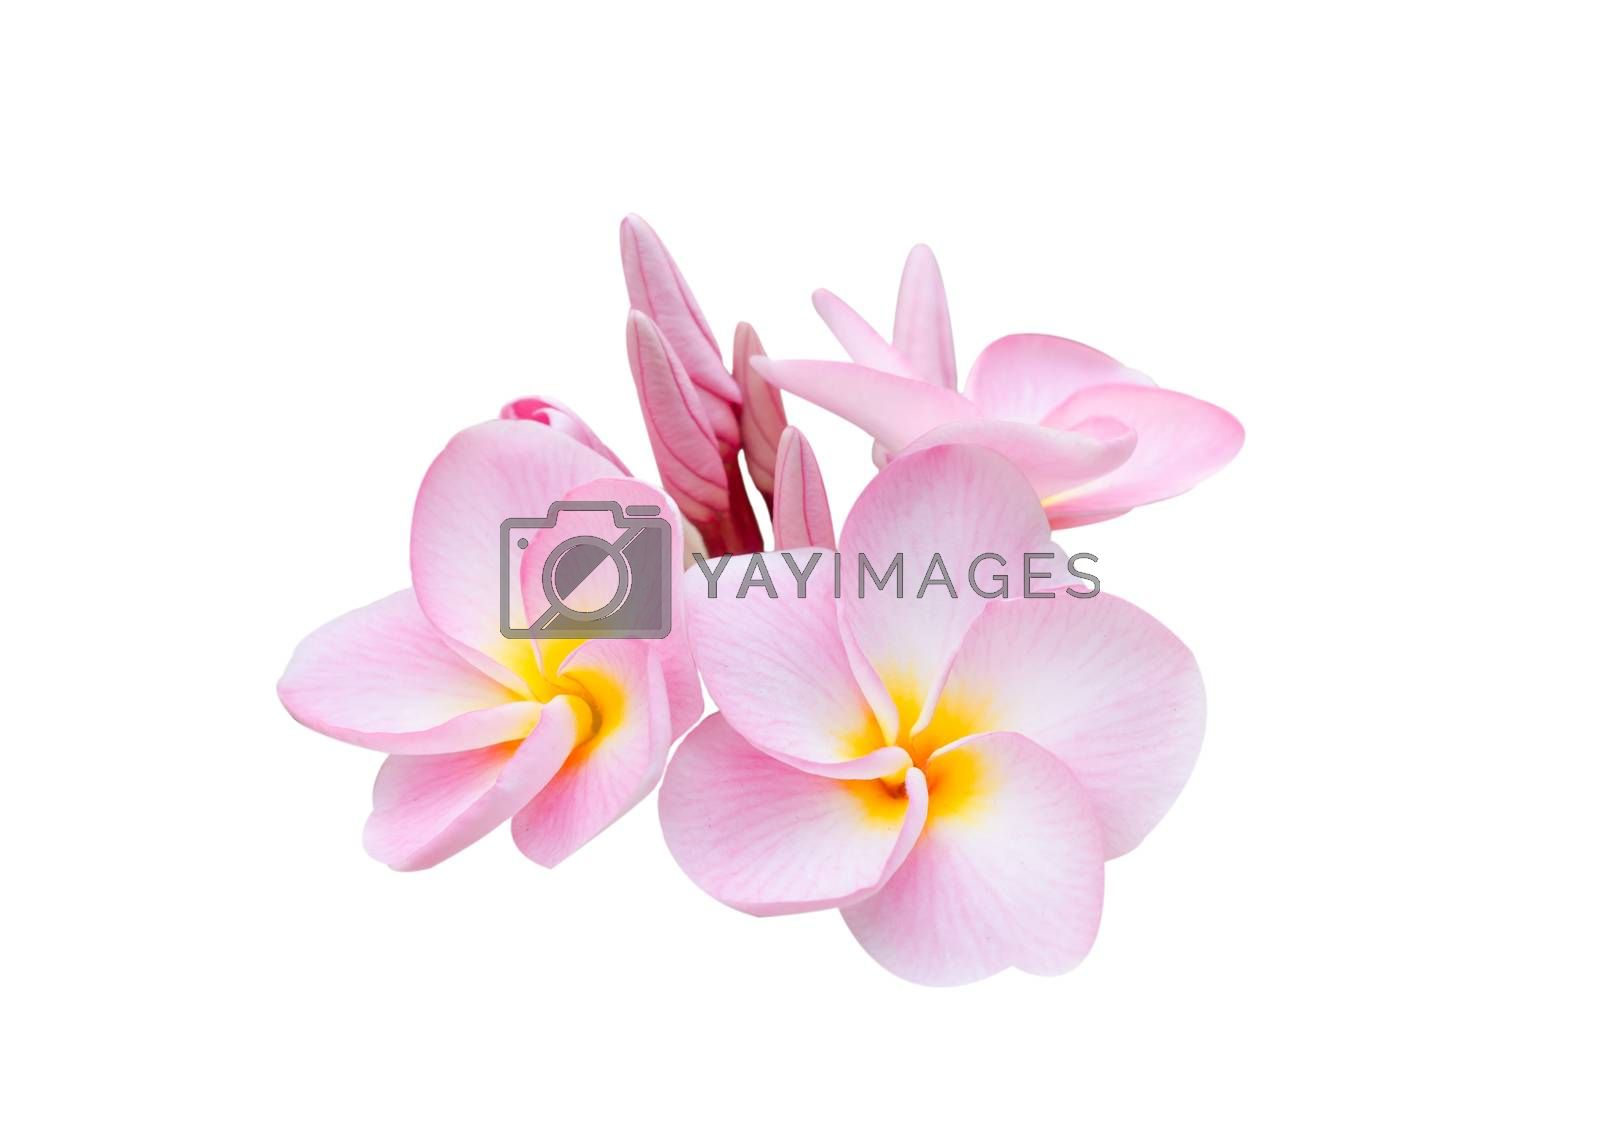 Royalty free image of Pumeria,  on white background by rakratchada